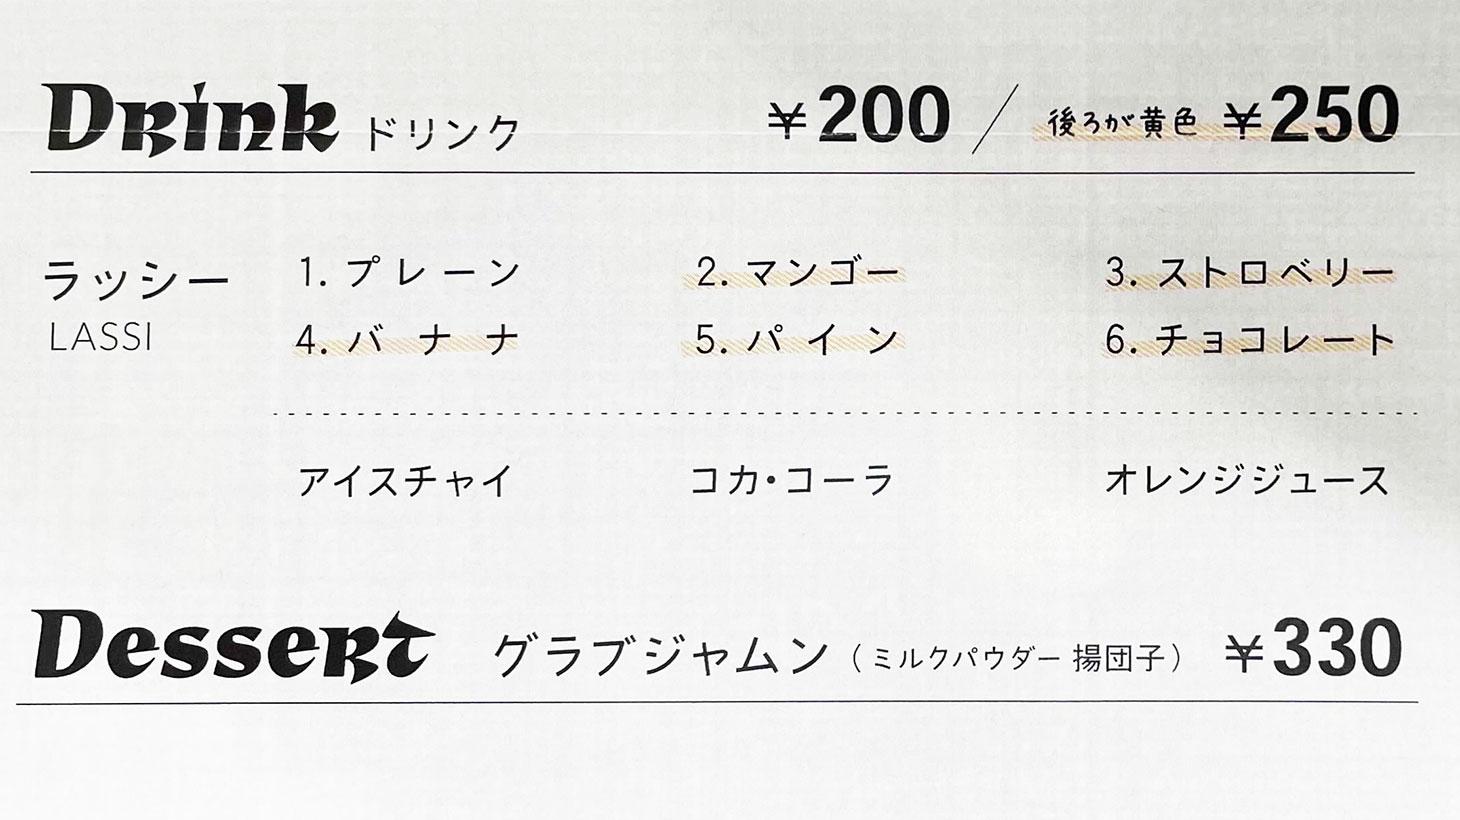 TANDOORI NIPPONドリンク・デザートメニュー